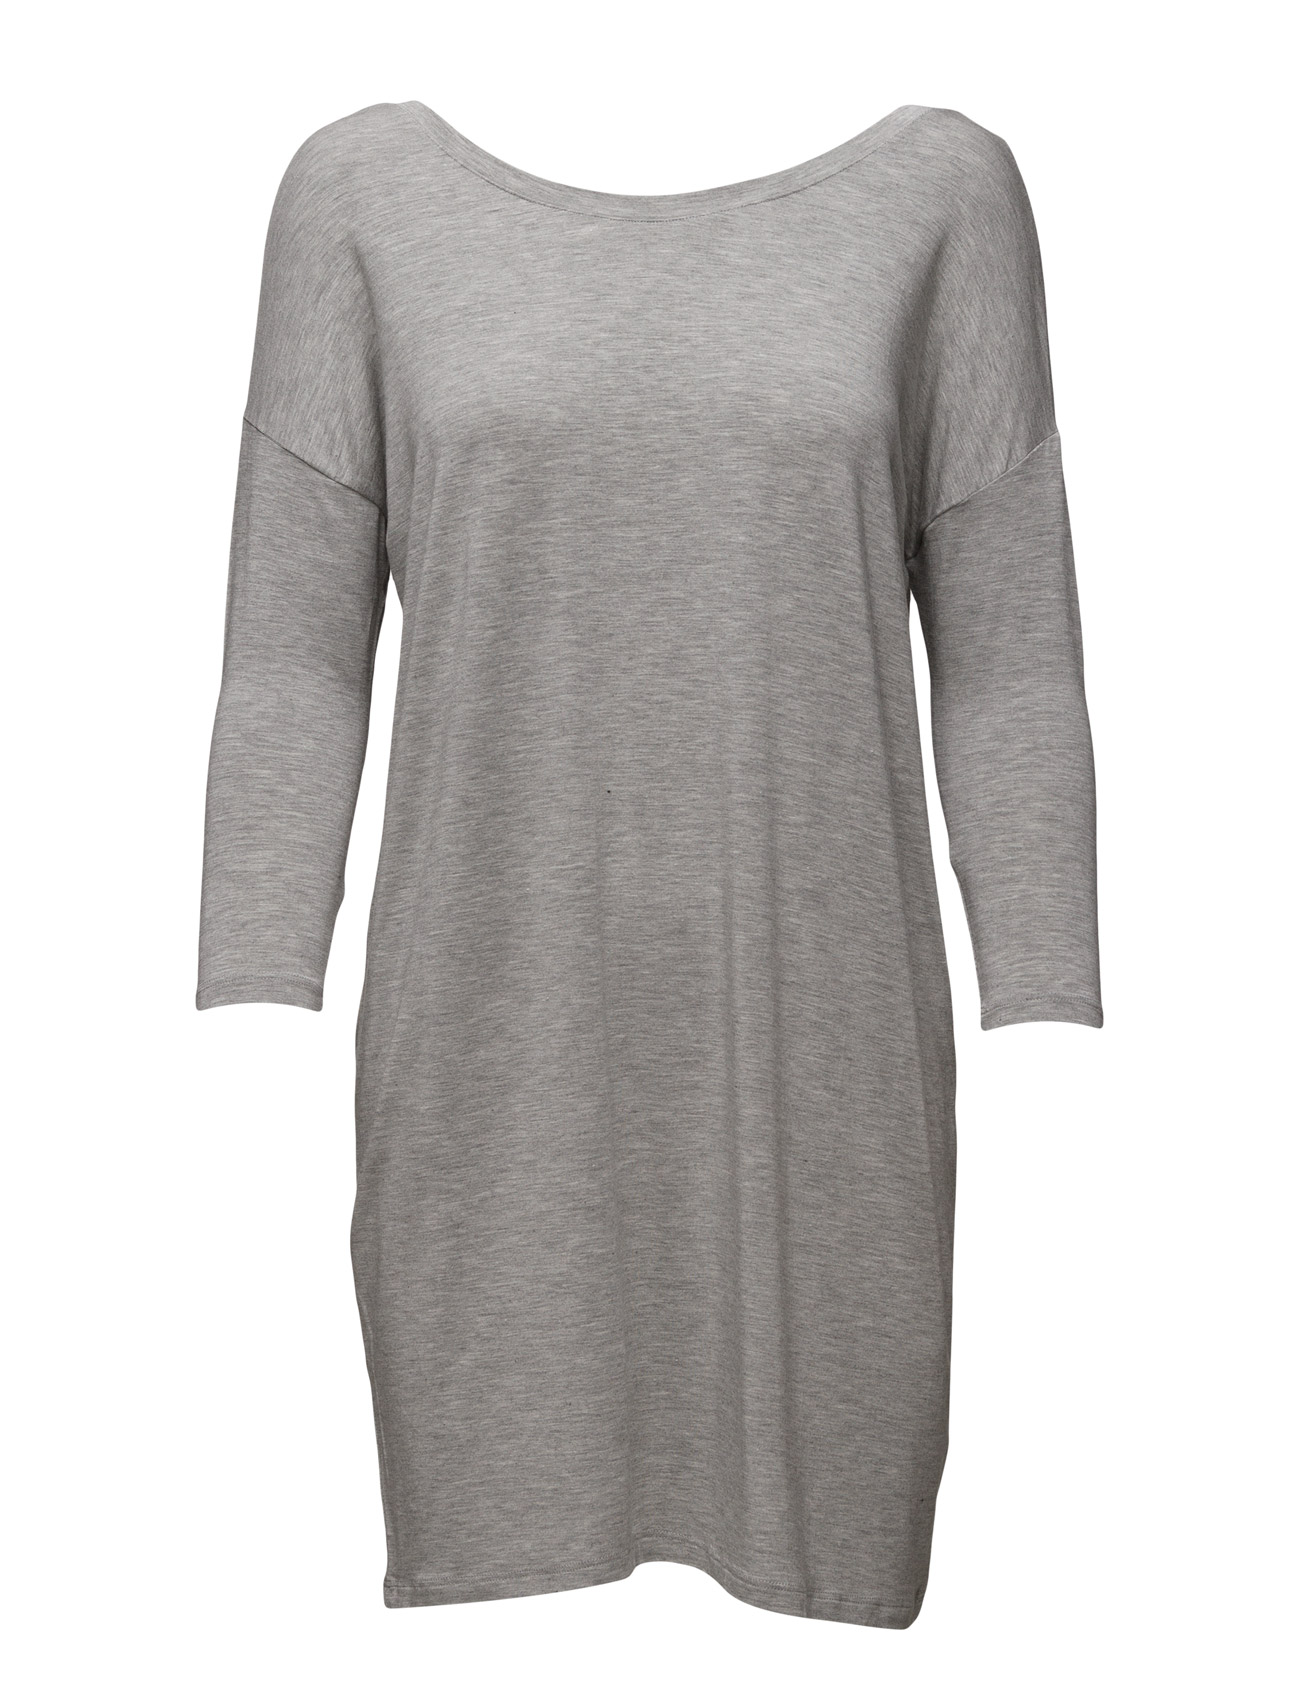 Lacy mbyM Korte kjoler til Damer i Light Grey Melange